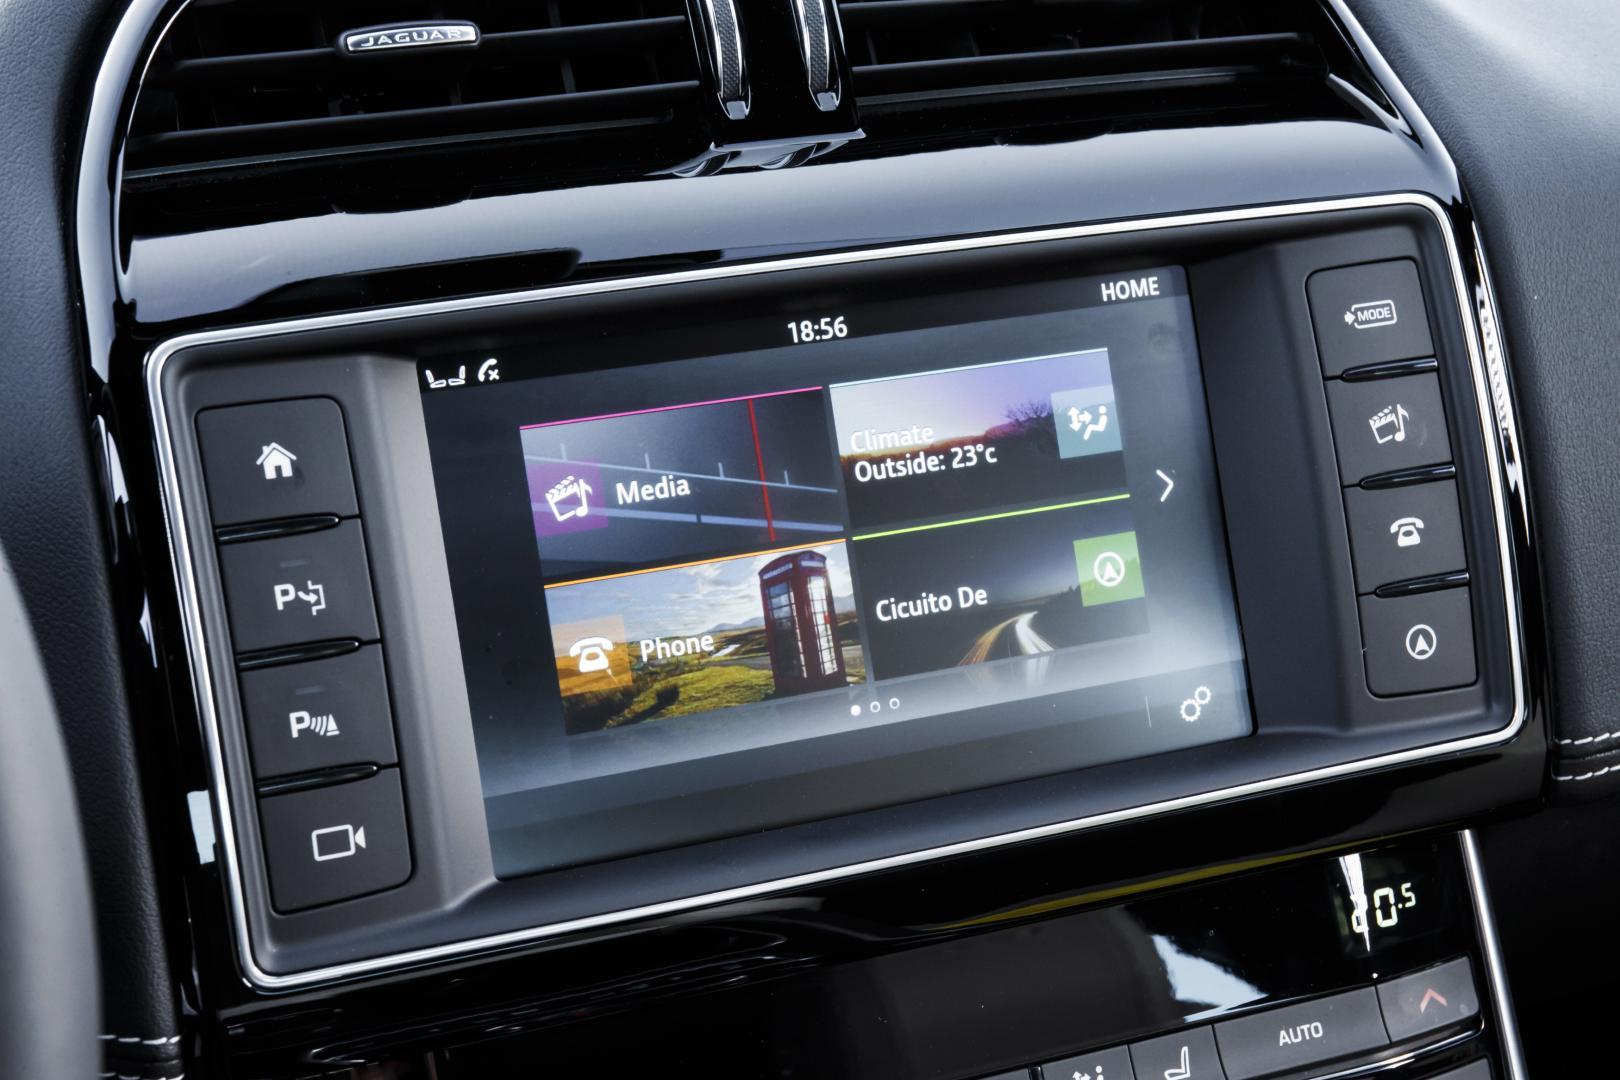 Jaguar XE S 3.0 V6 infotainment (2015)